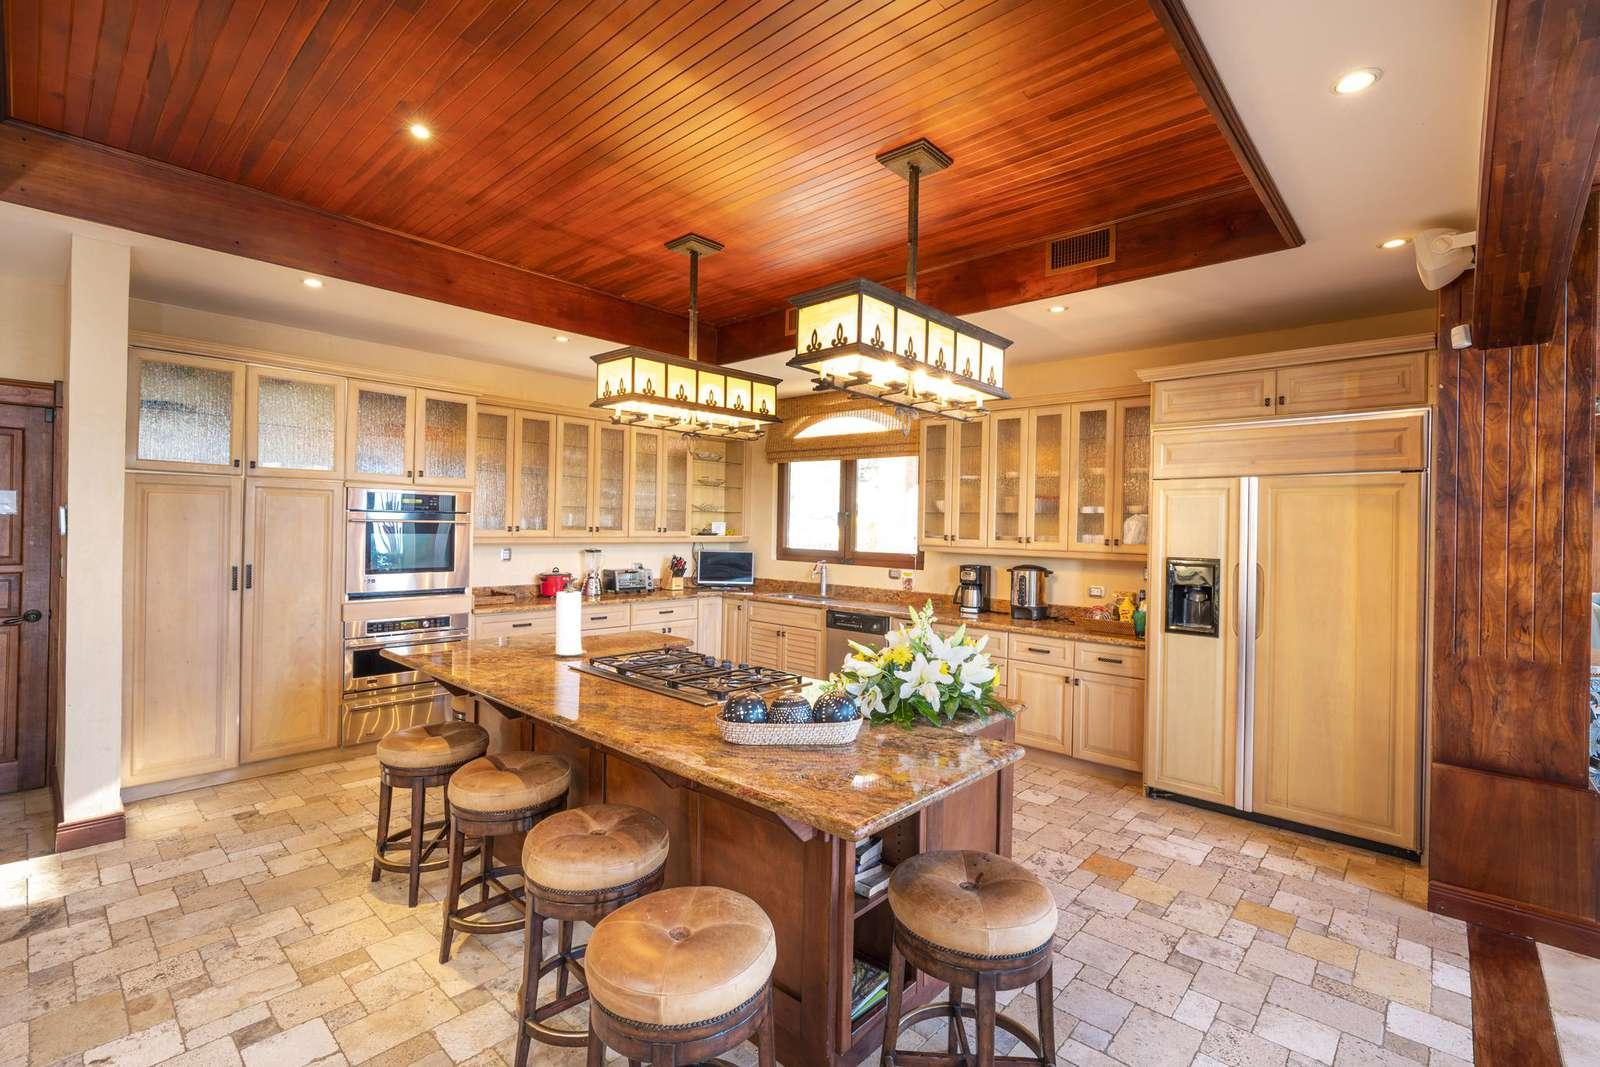 Gourmet kitchen, built in appliances, ice maker, breakfast bar